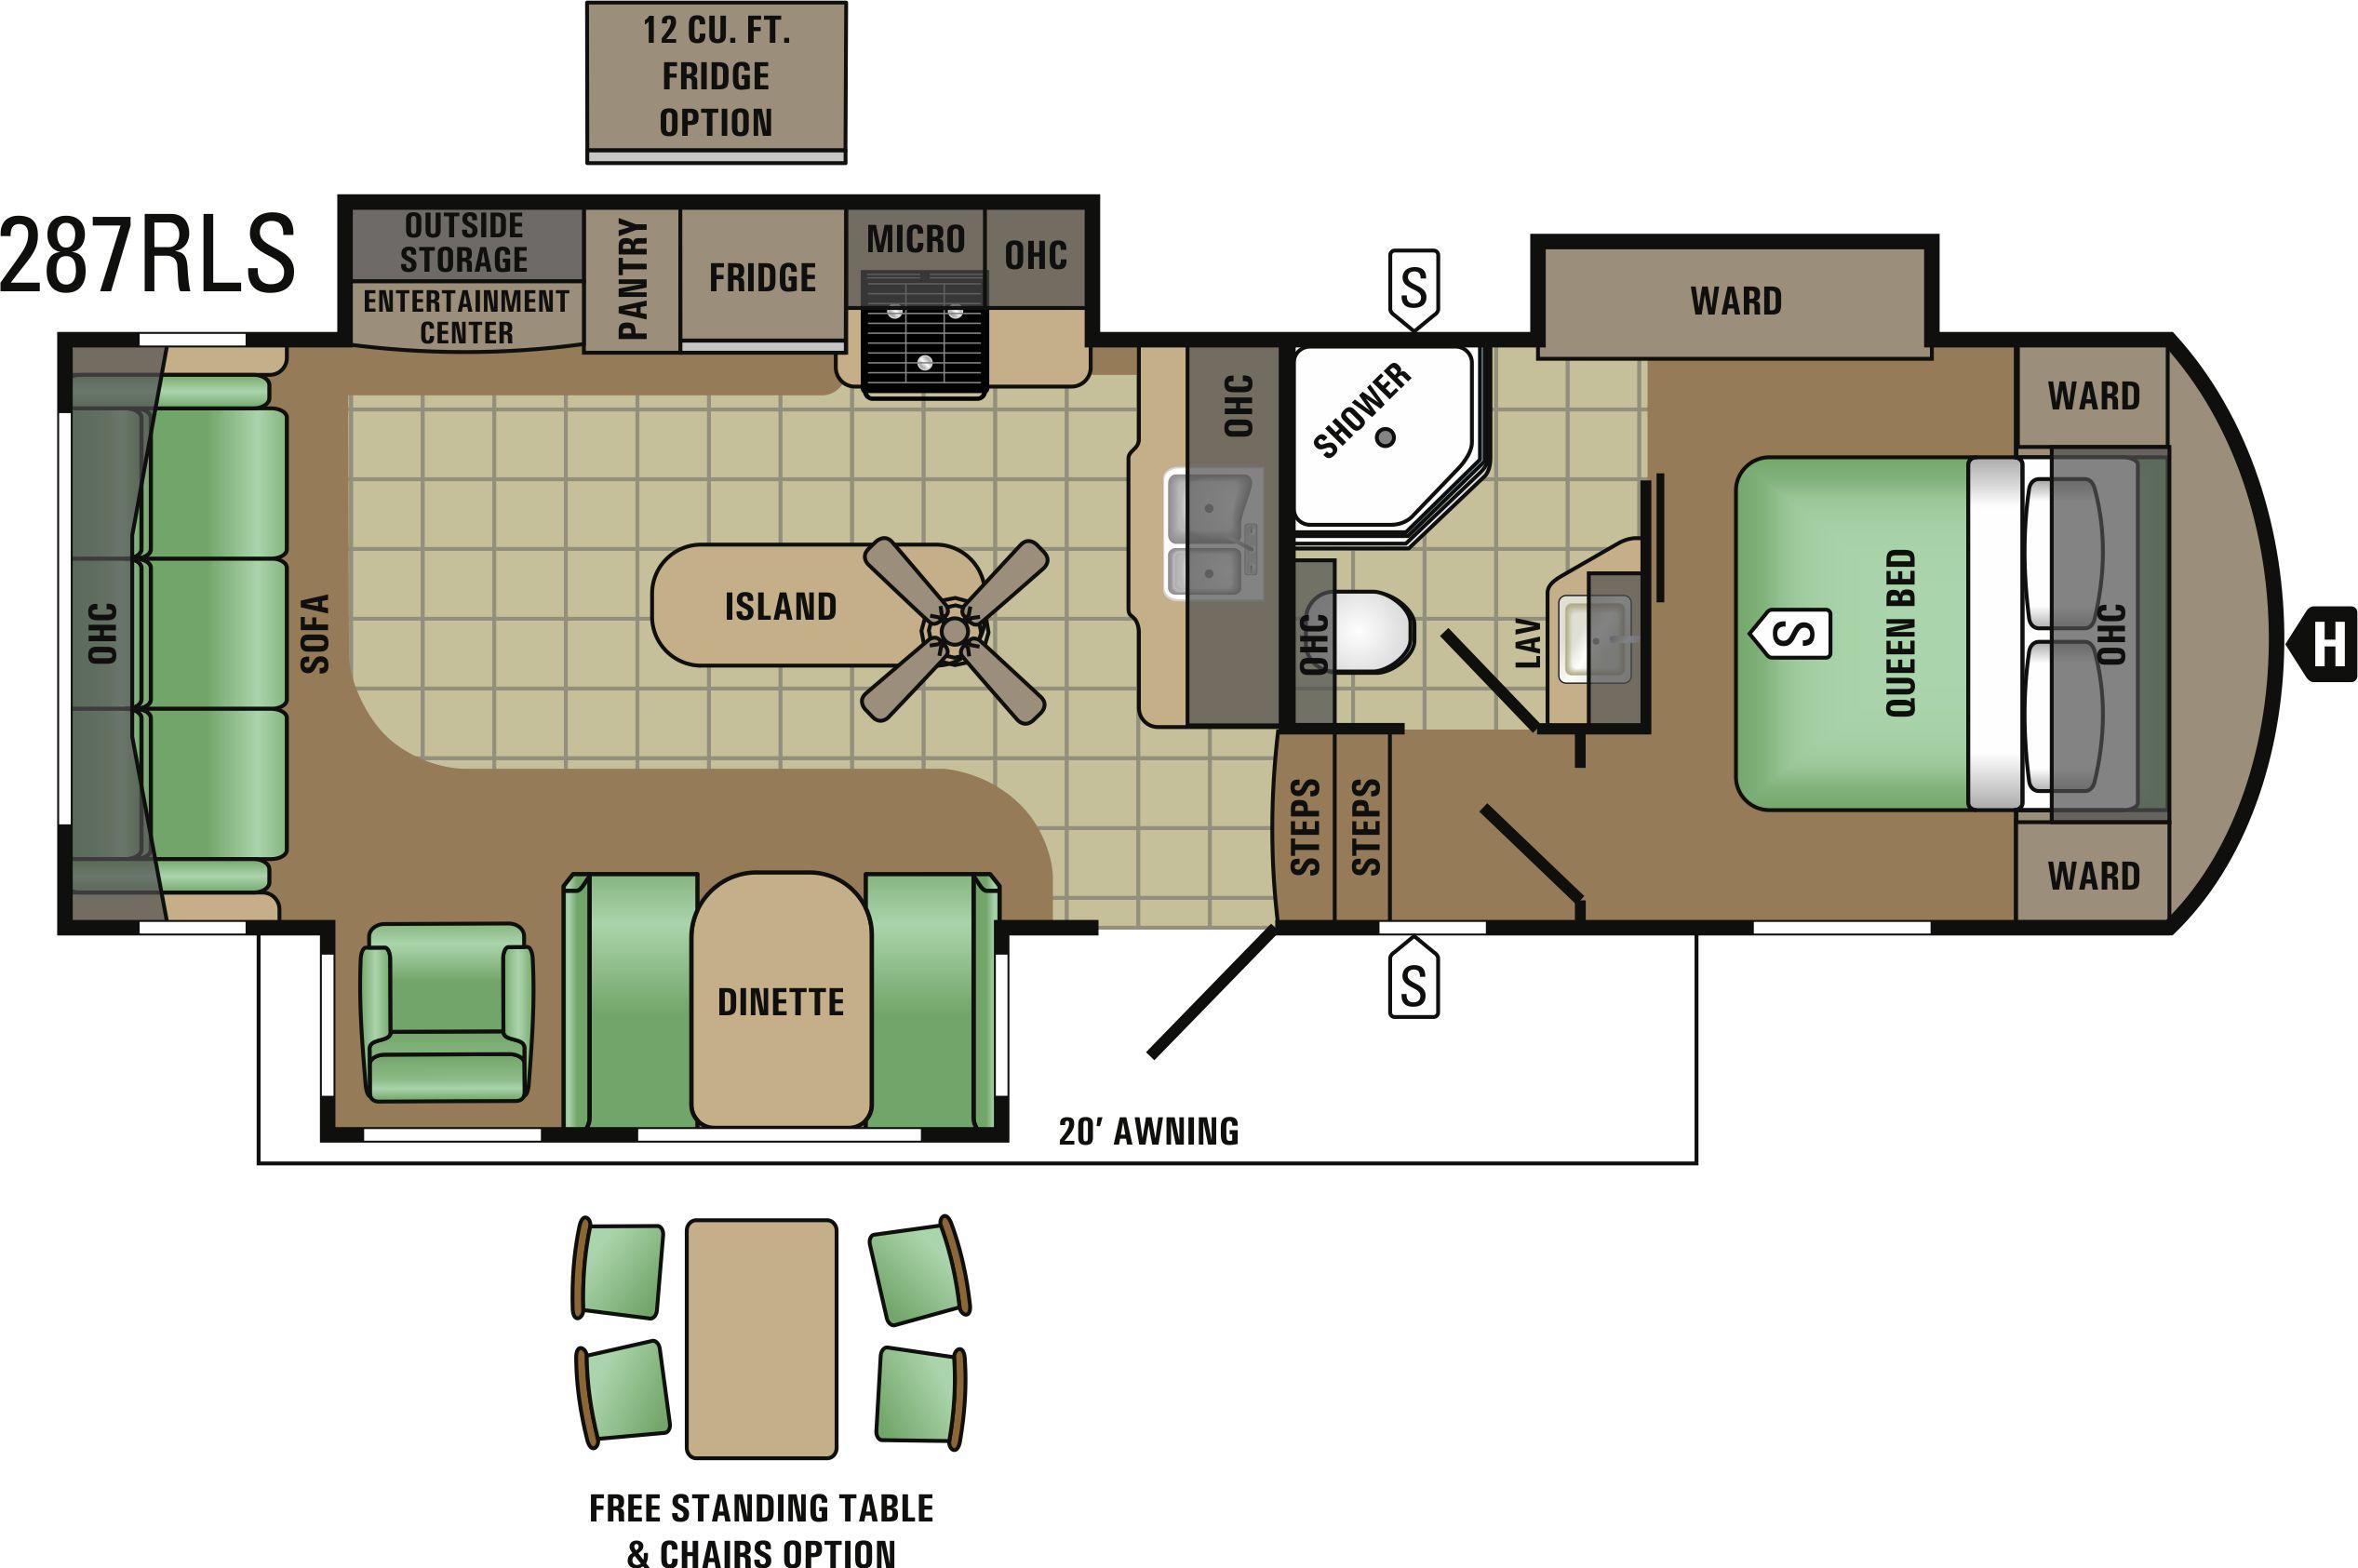 287RLS Floorplan